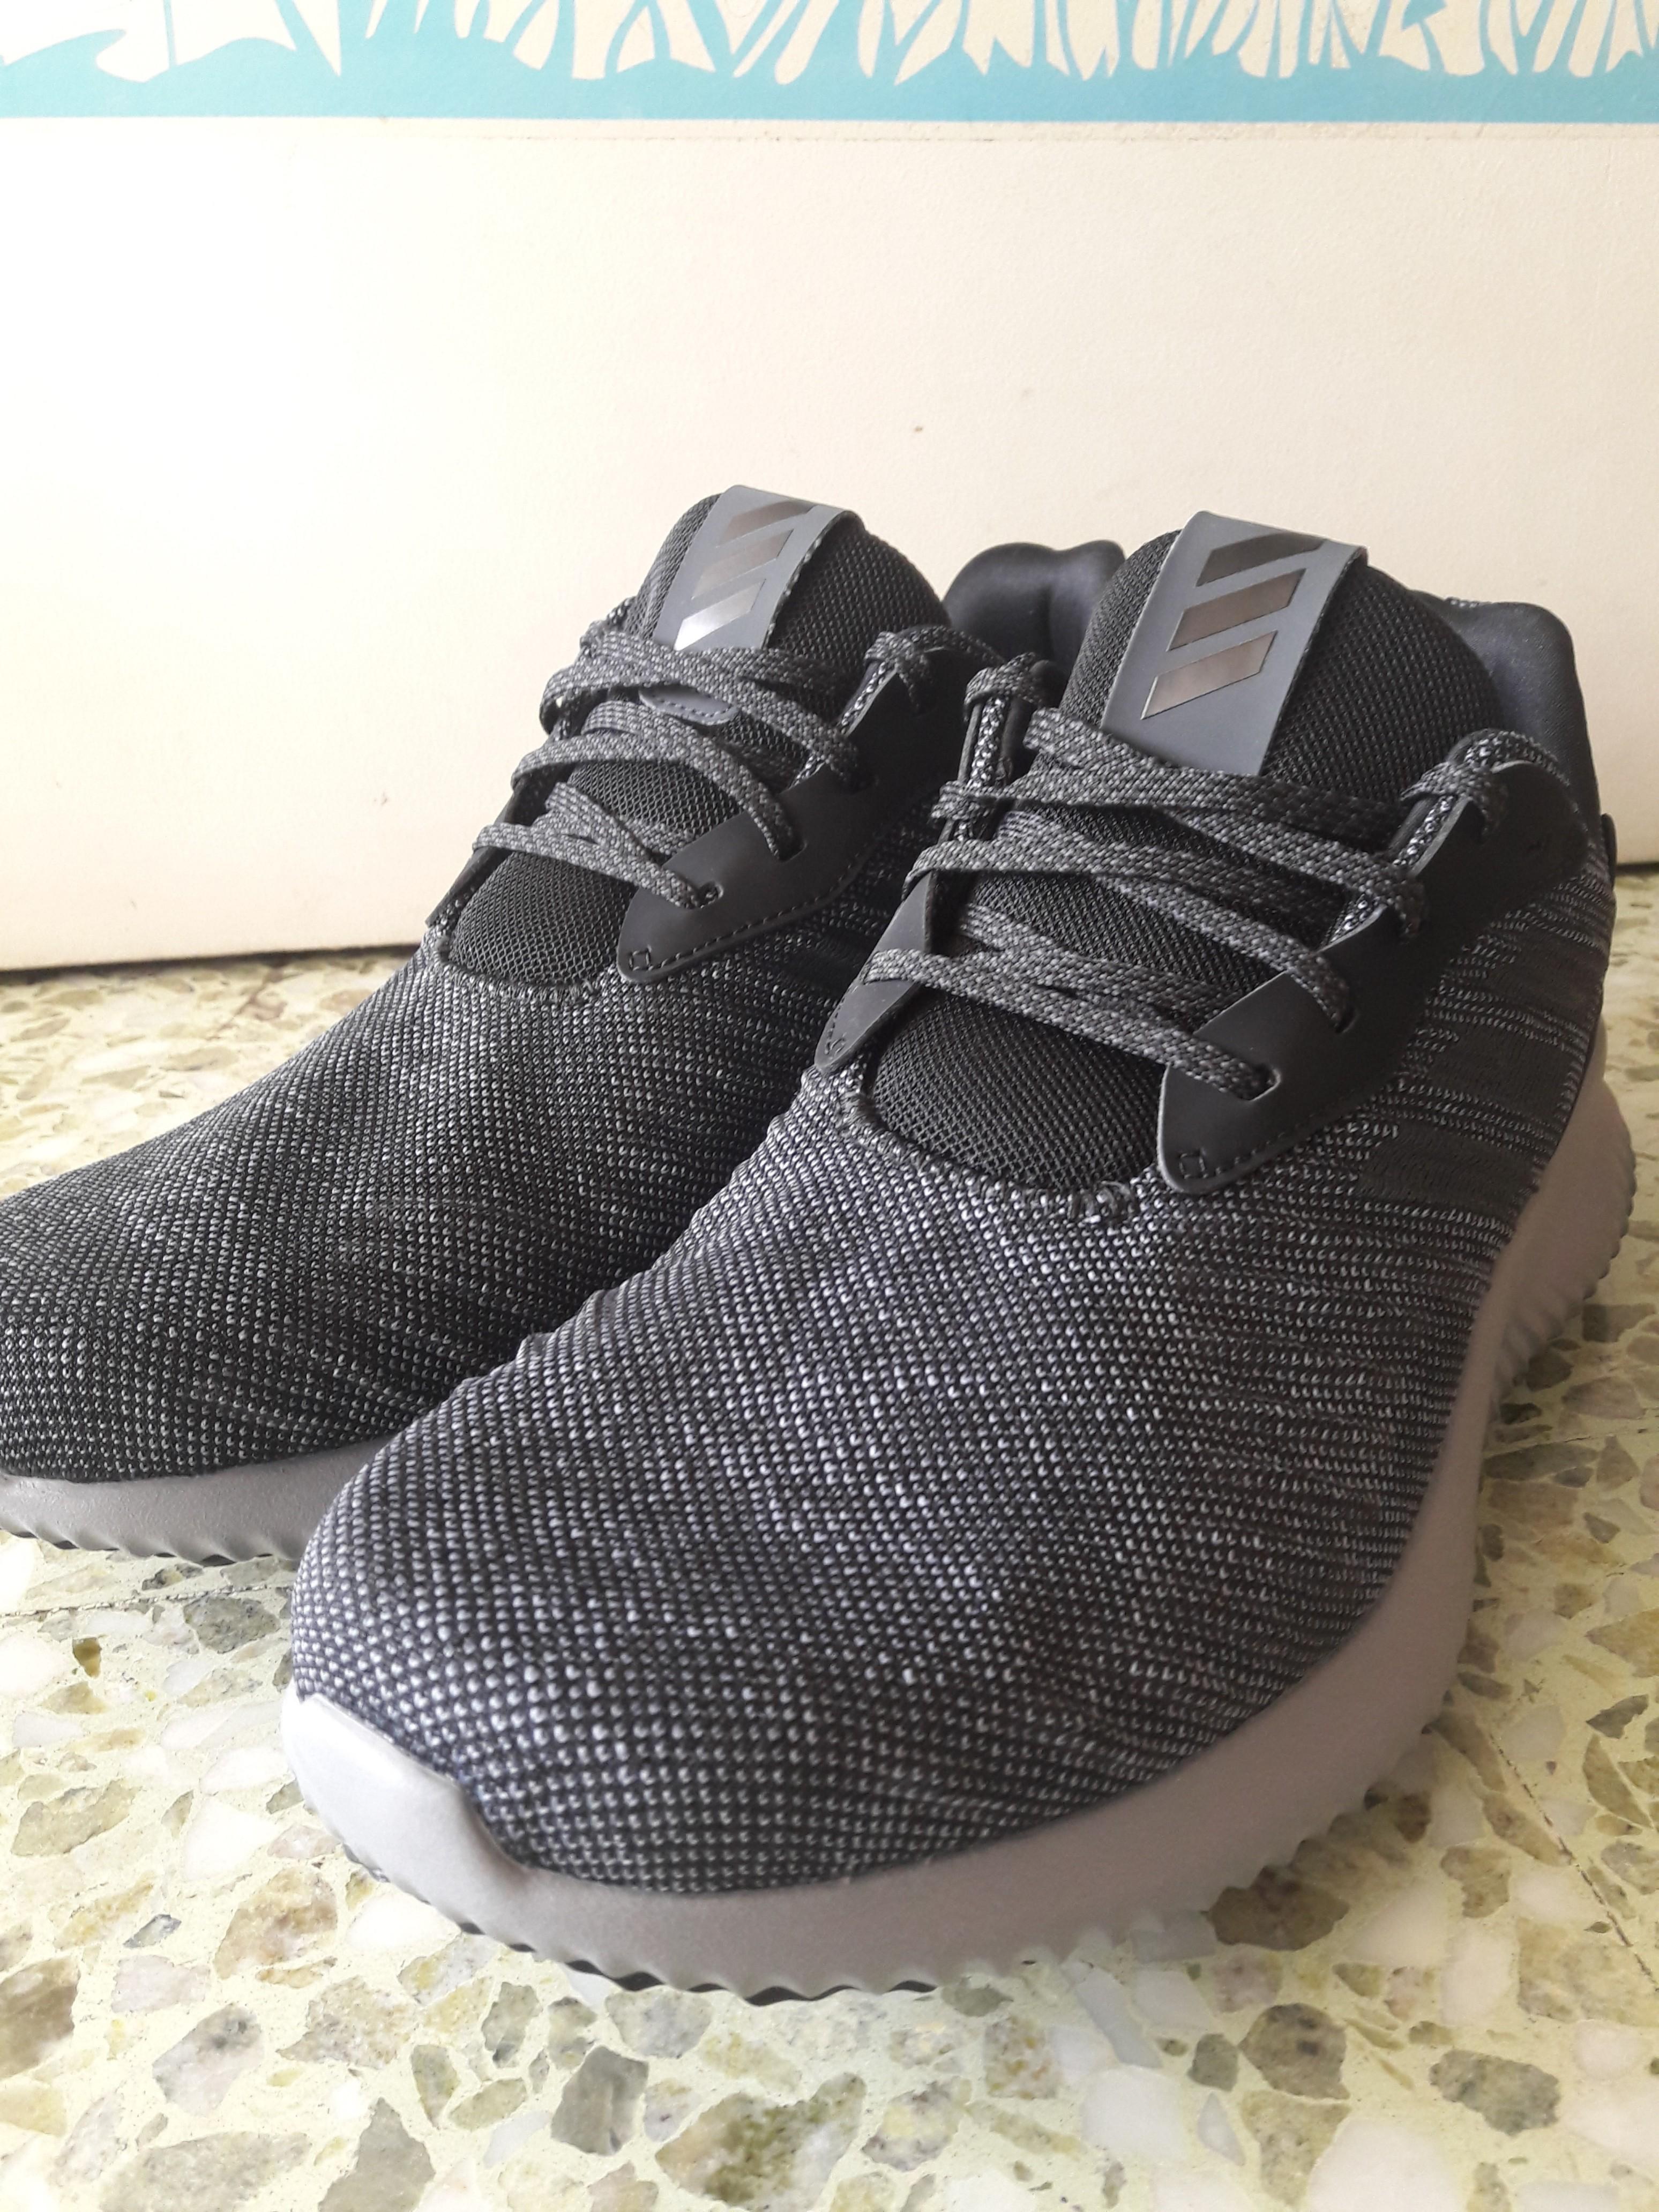 5acc70056 Adidas Alphabounce black grey